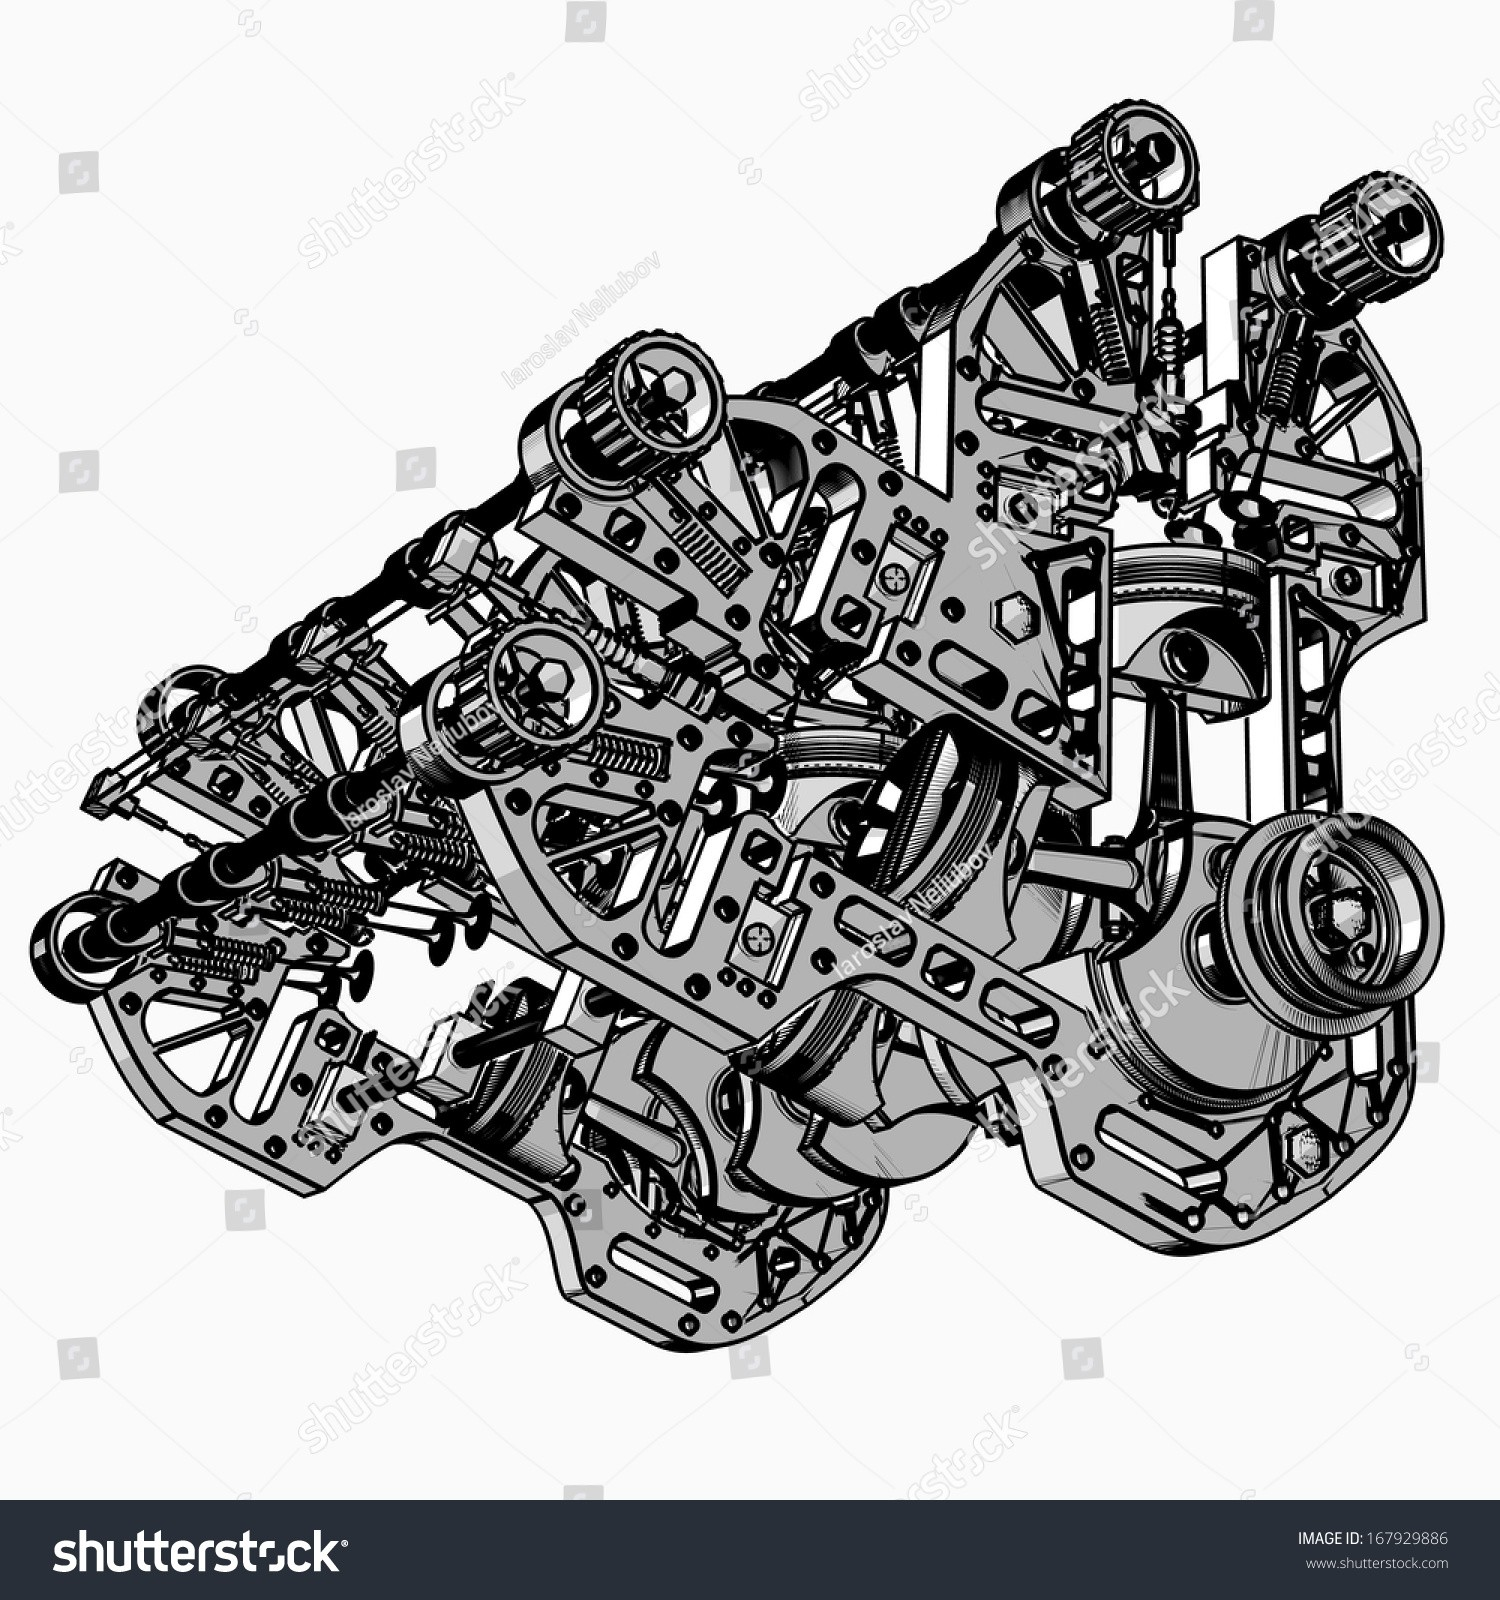 hight resolution of animated v8 engine diagram v 8 car engine black white drawing stock boxer engine animation v8